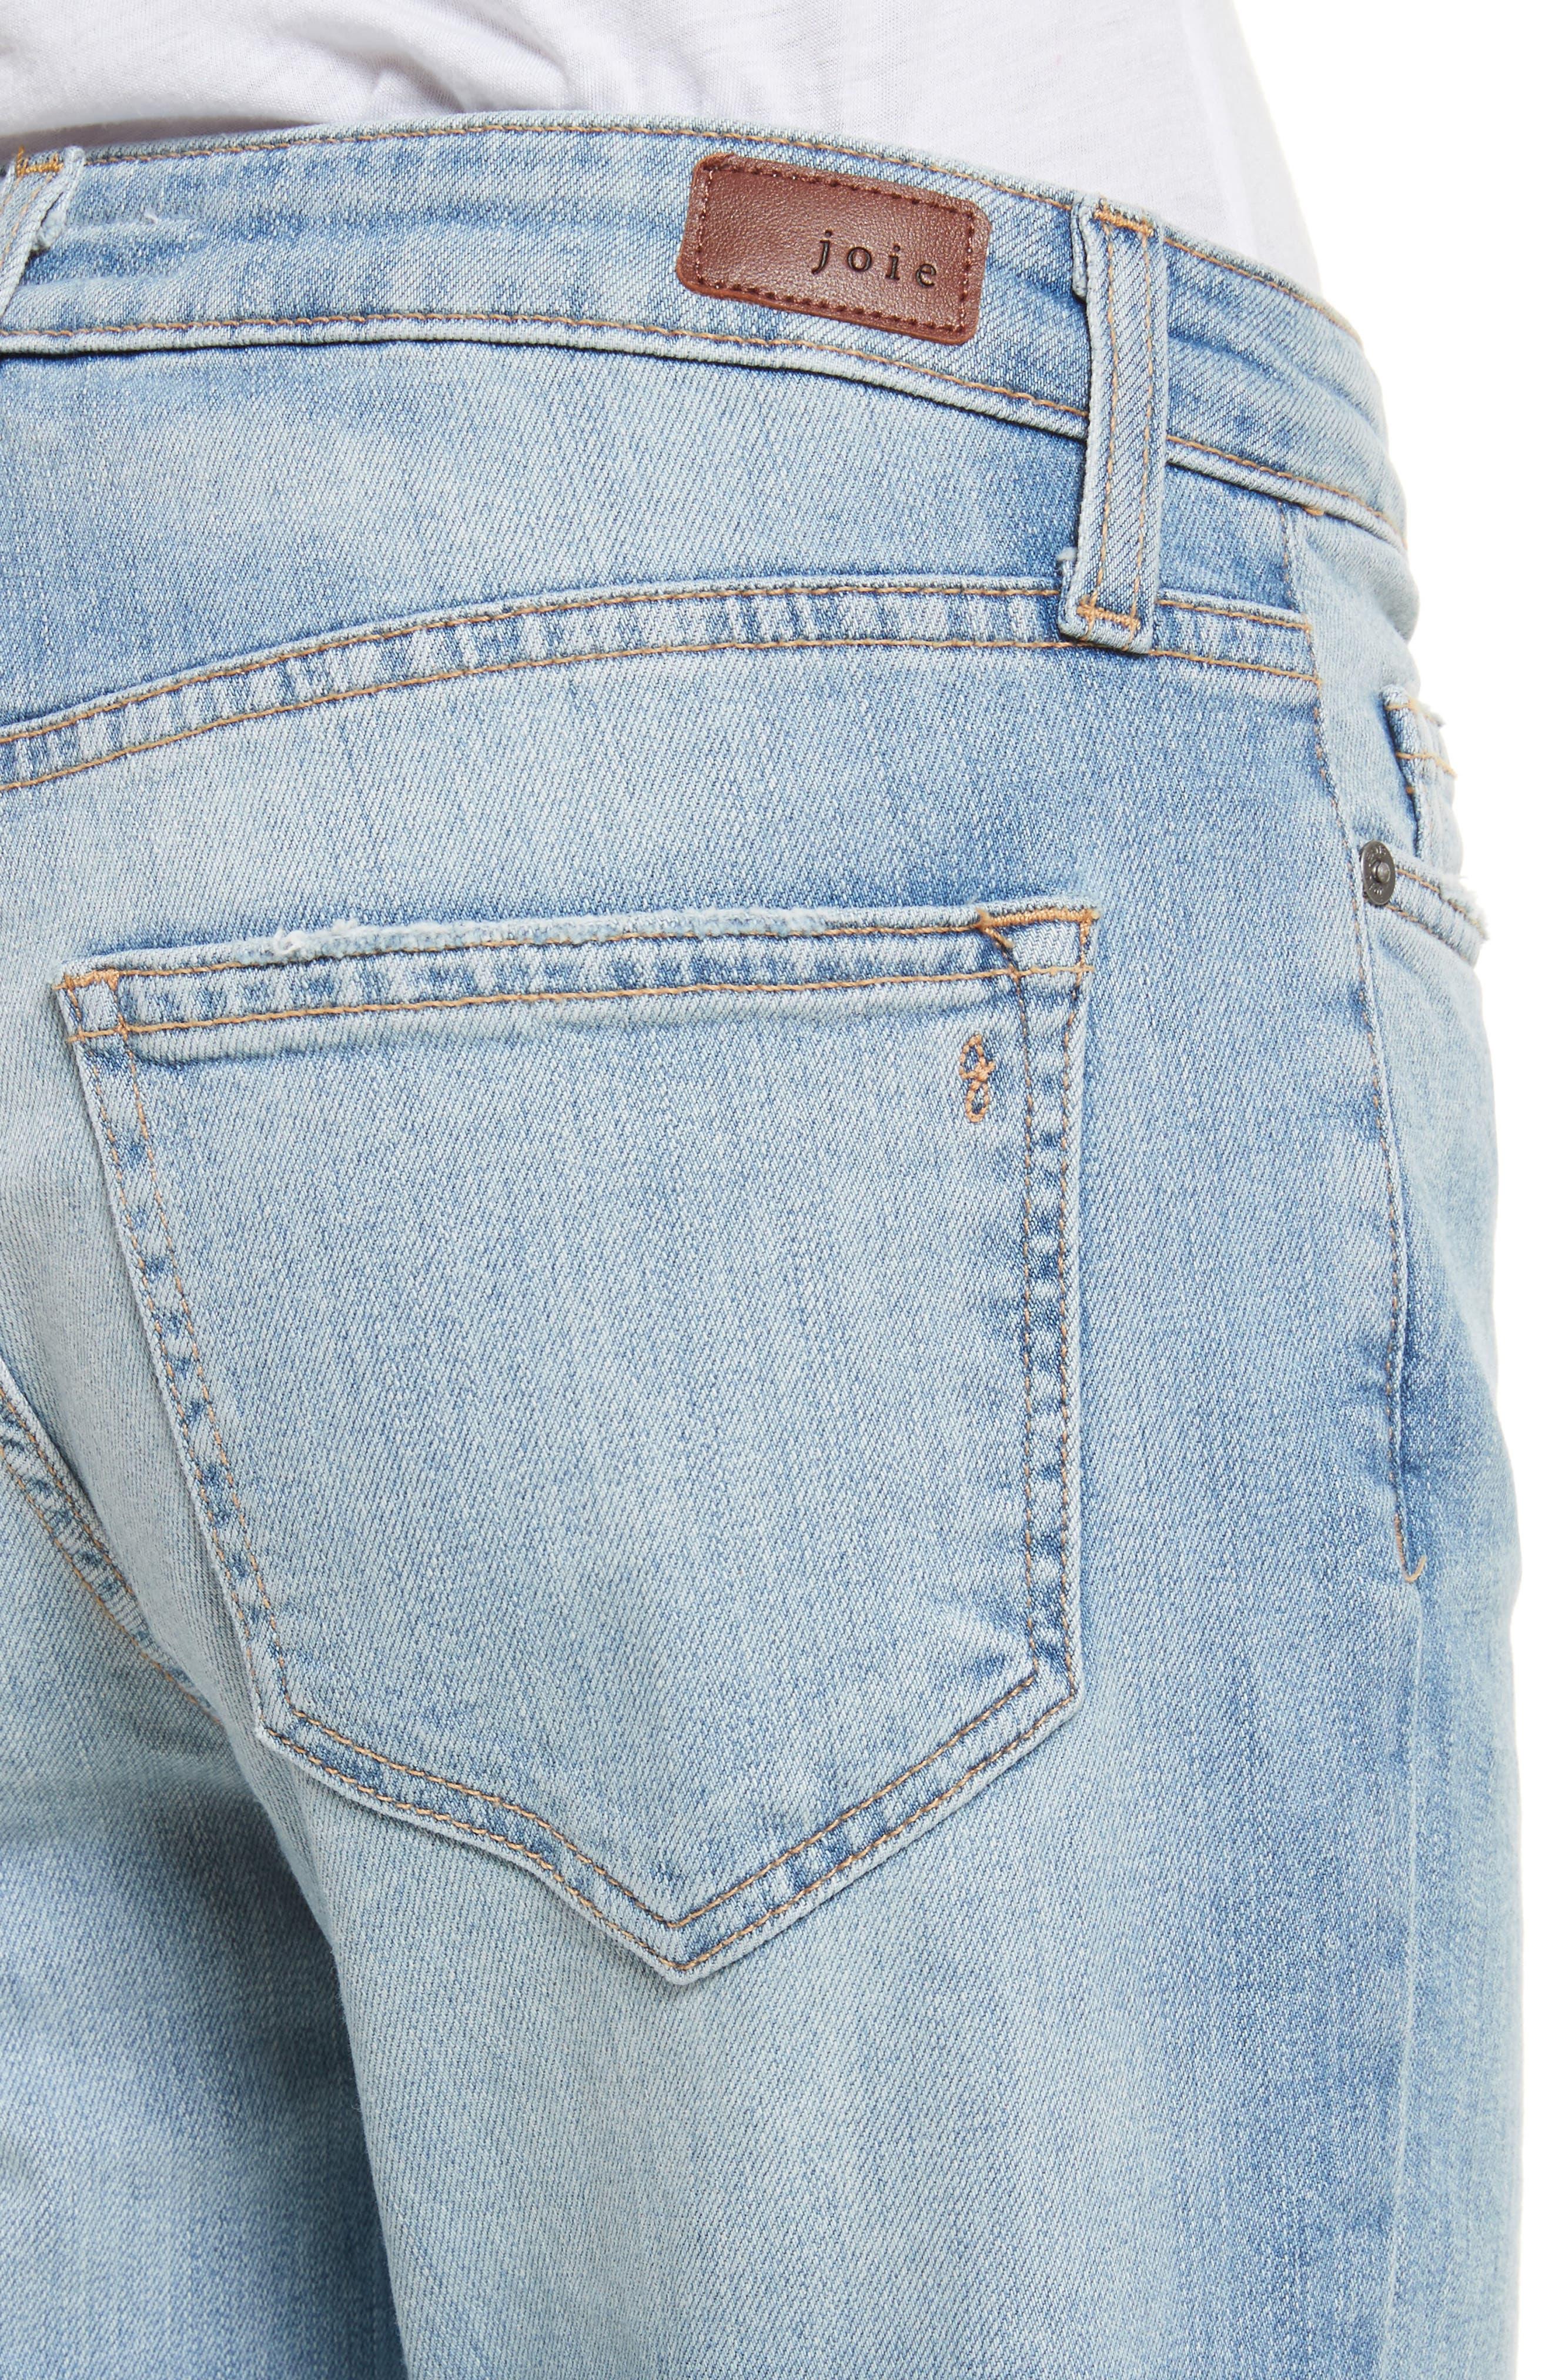 Josalind Straight Leg Crop Jeans,                             Alternate thumbnail 4, color,                             479